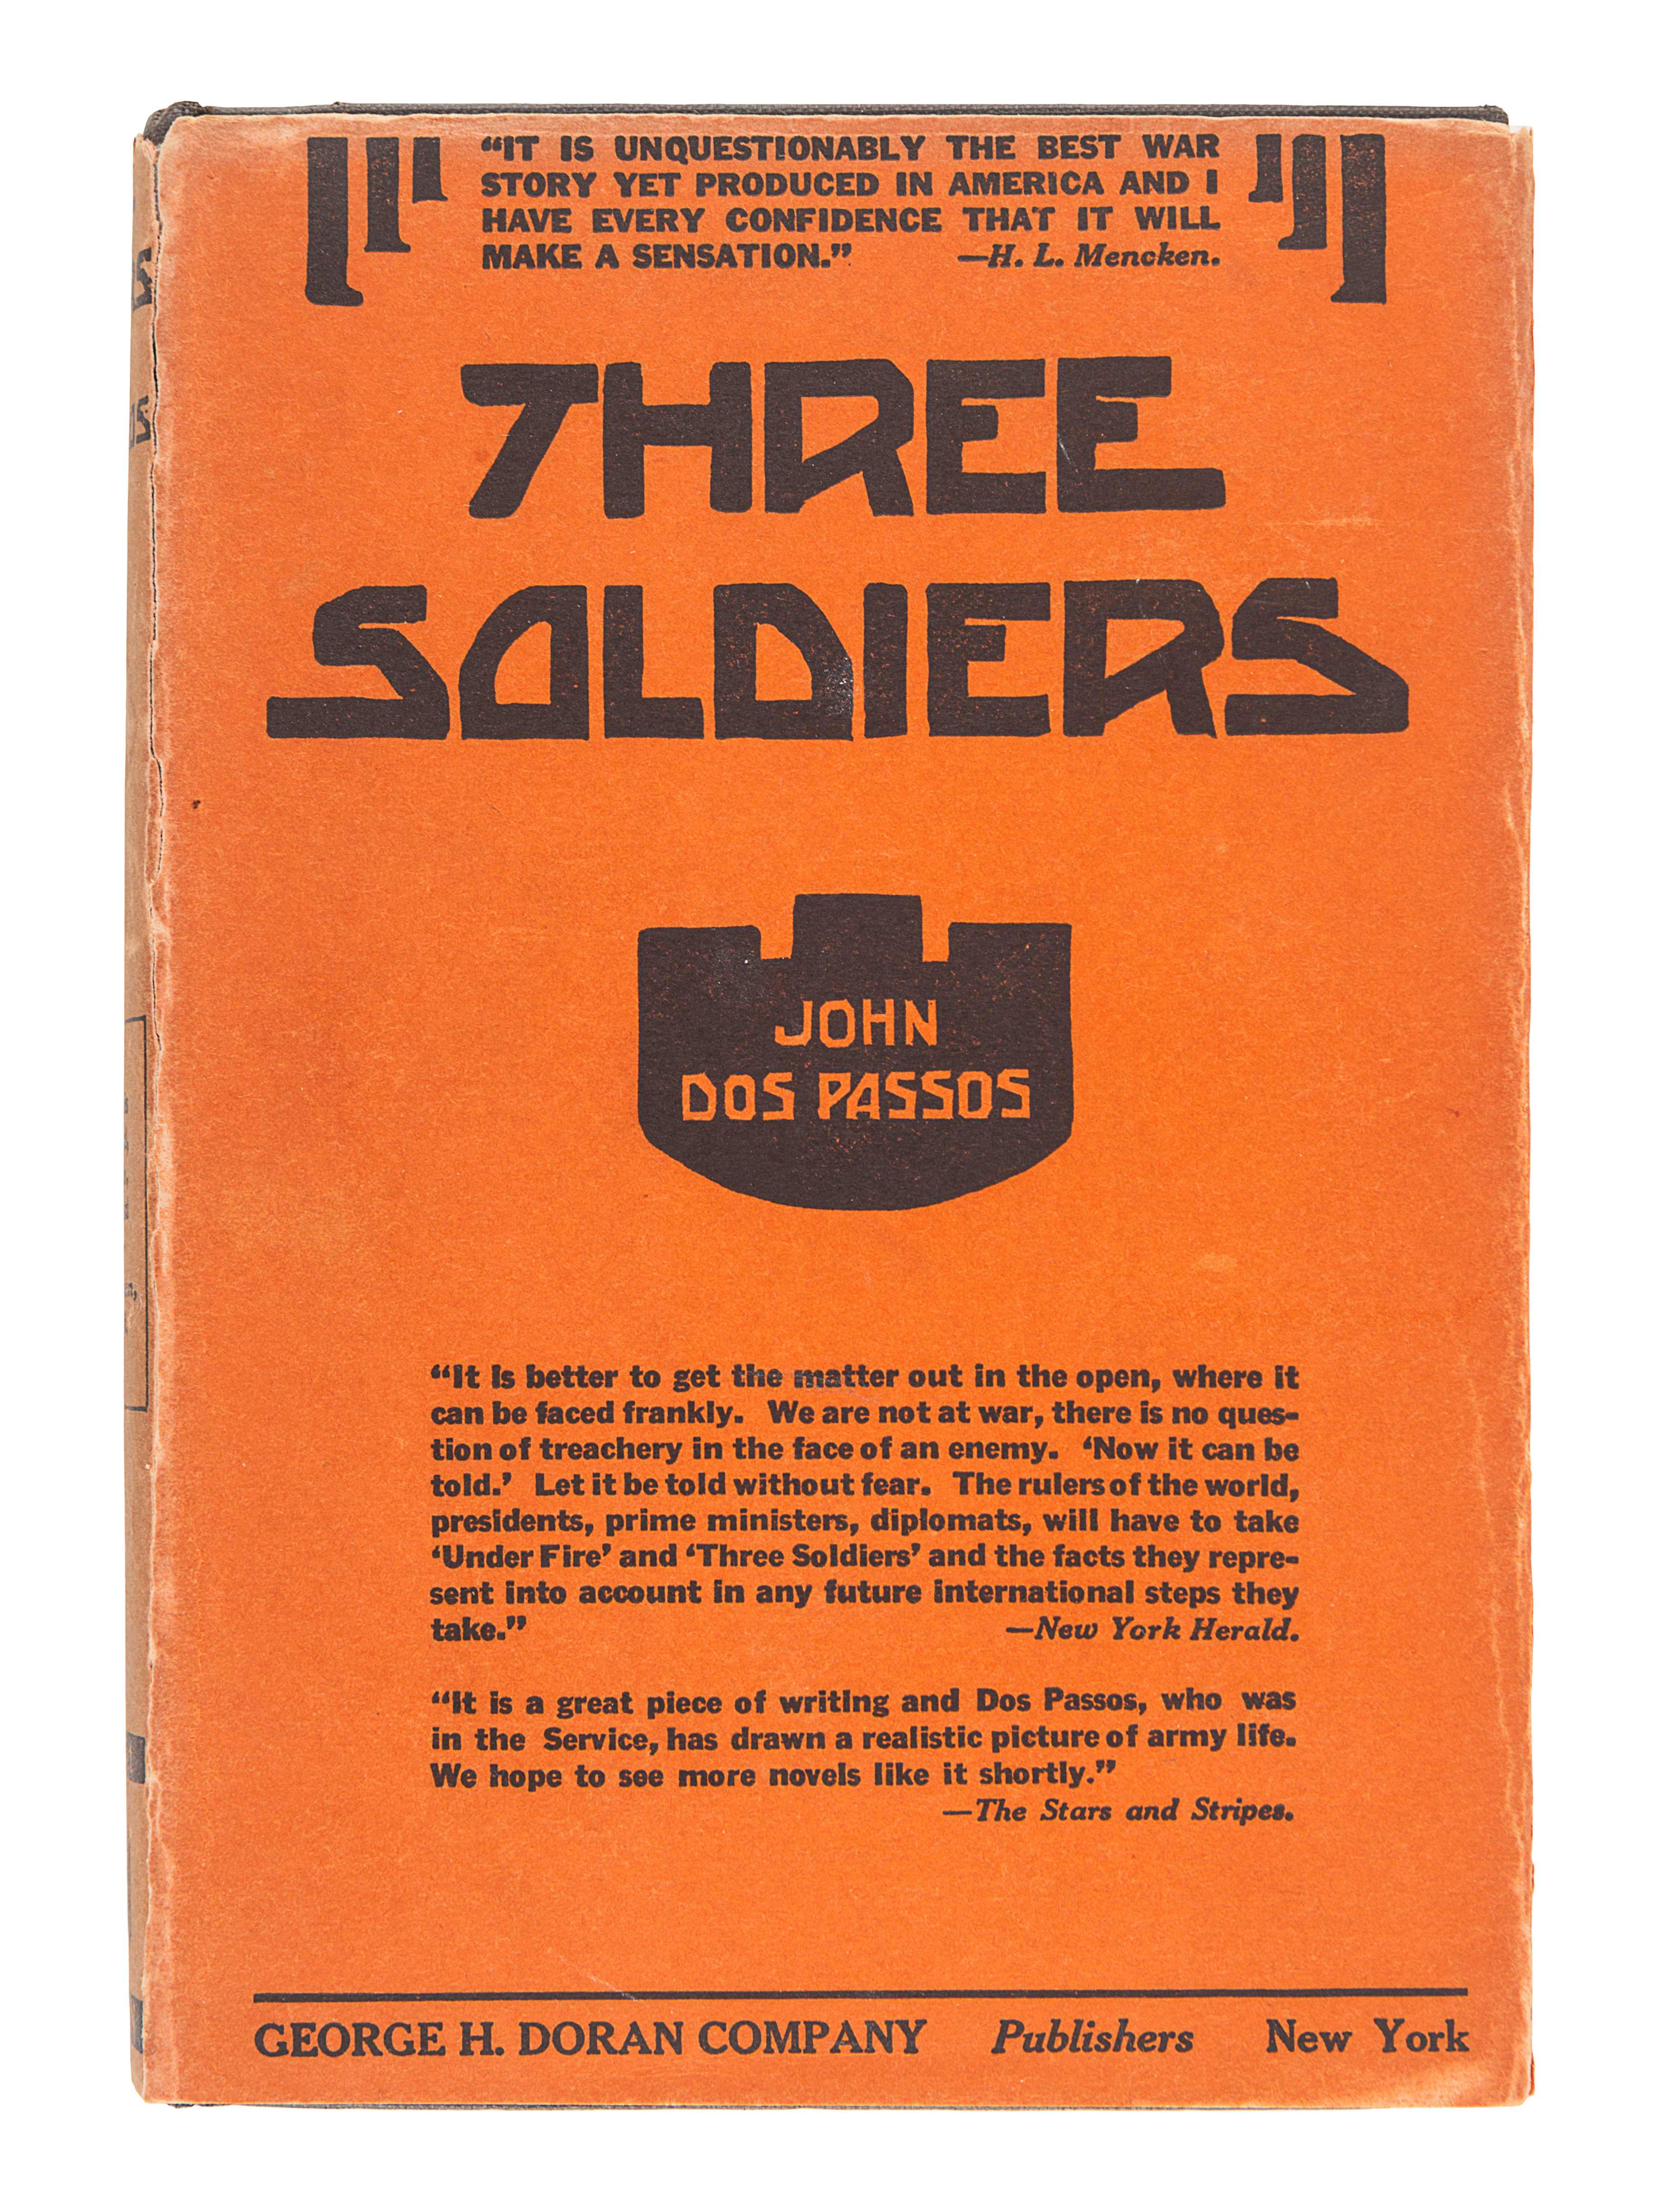 DOS PASSOS, John (1896-1970). Three Soldiers. New York: George H. Doran, 1921.